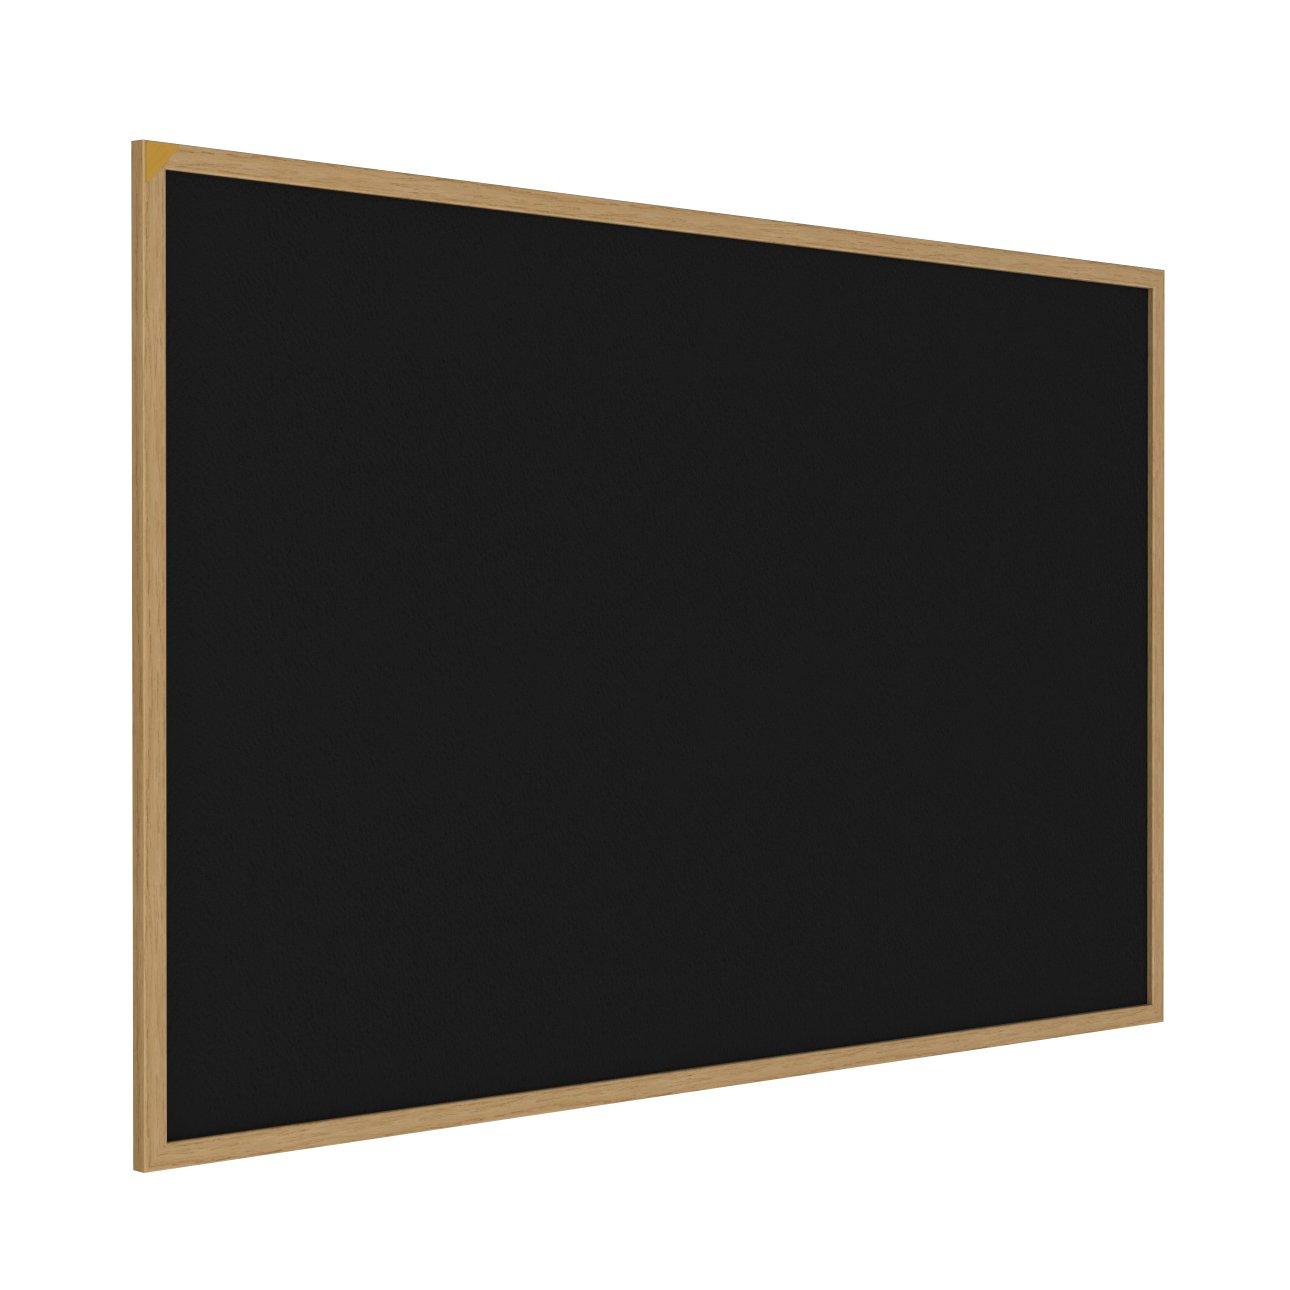 Ghent 2'' x 3'' Wood Frame, Oak Finish Recycled Rubber Bulletin Board, Black (WTR23-BK)